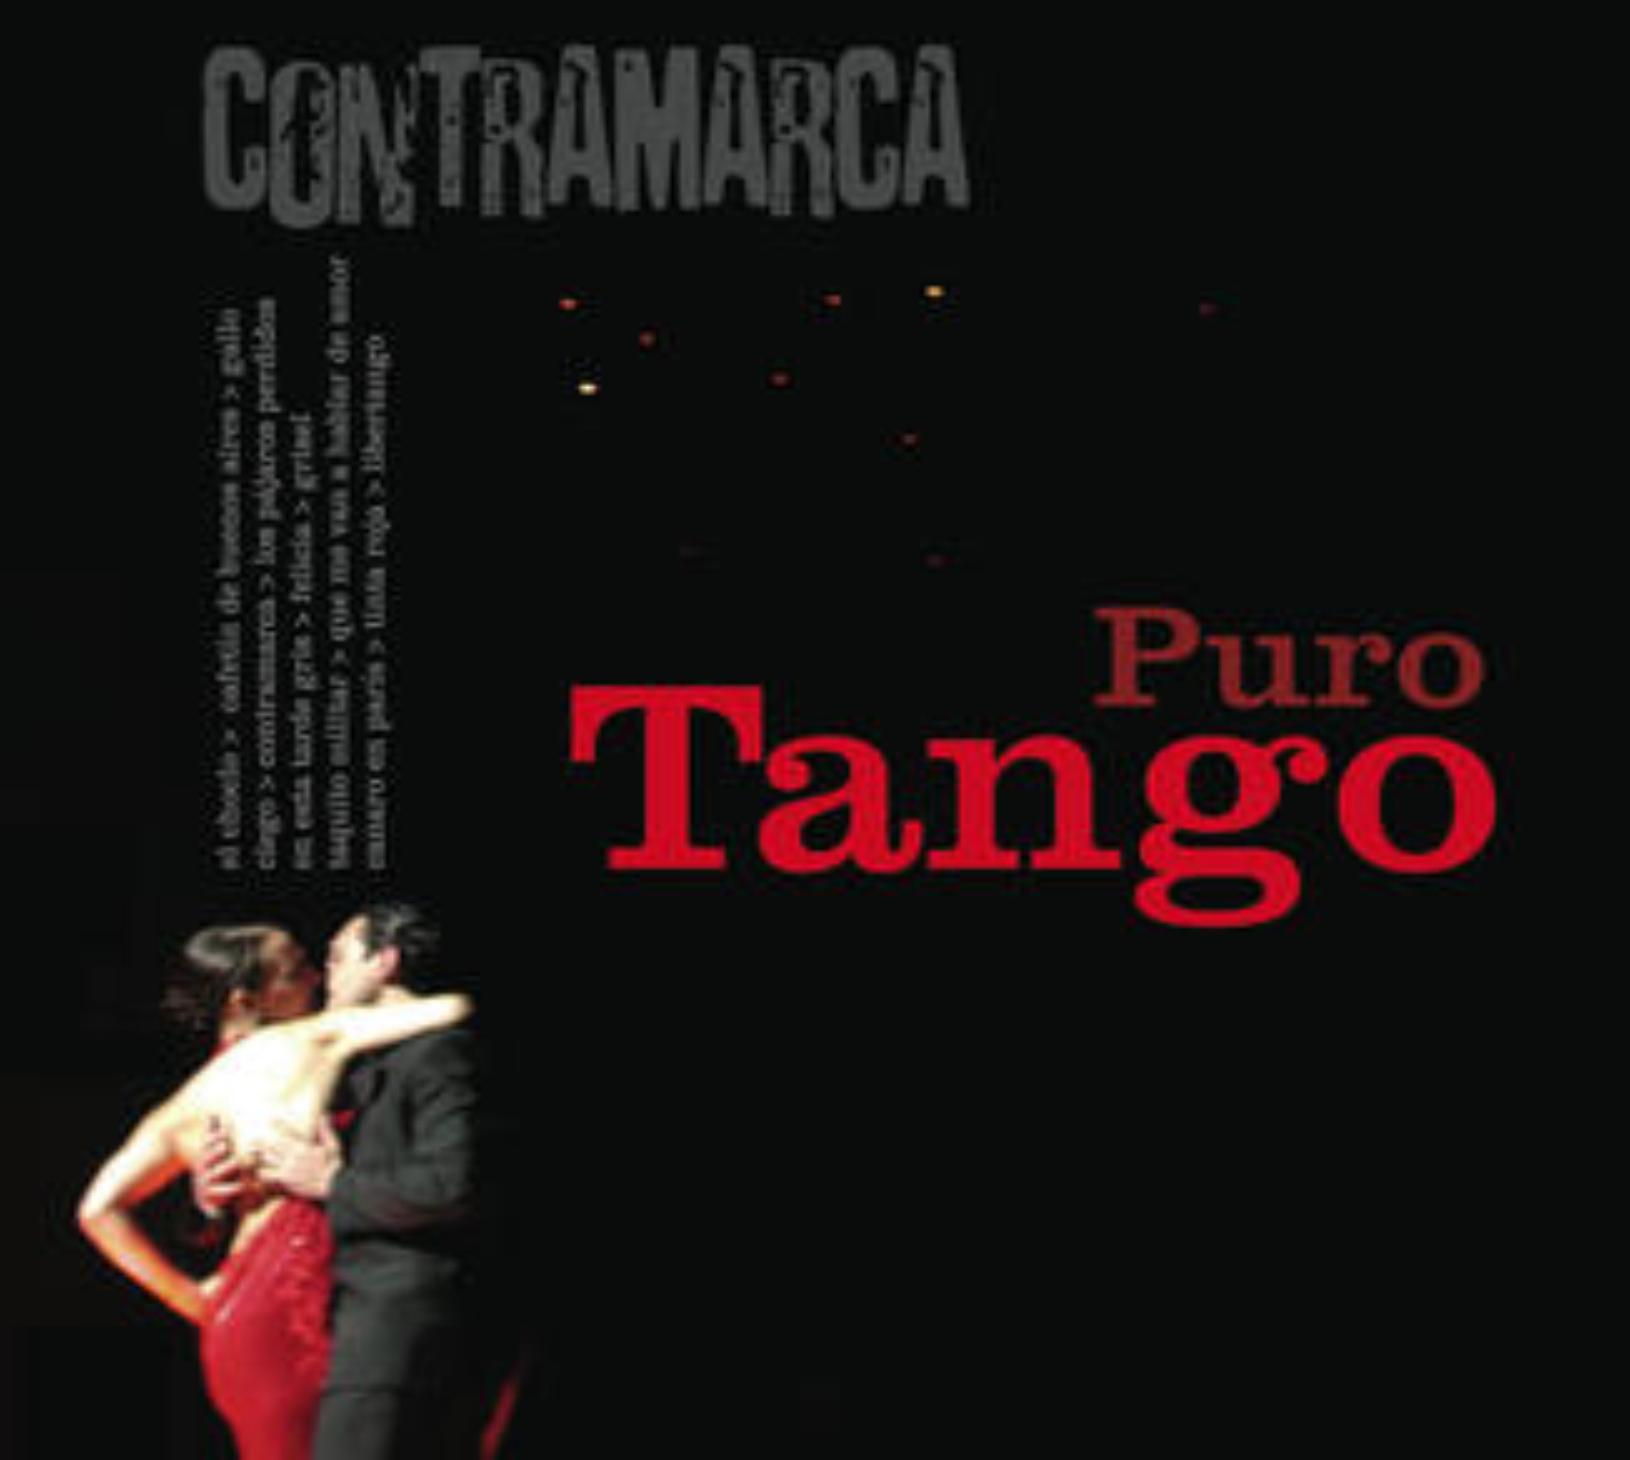 Puro Tango - Contramarca